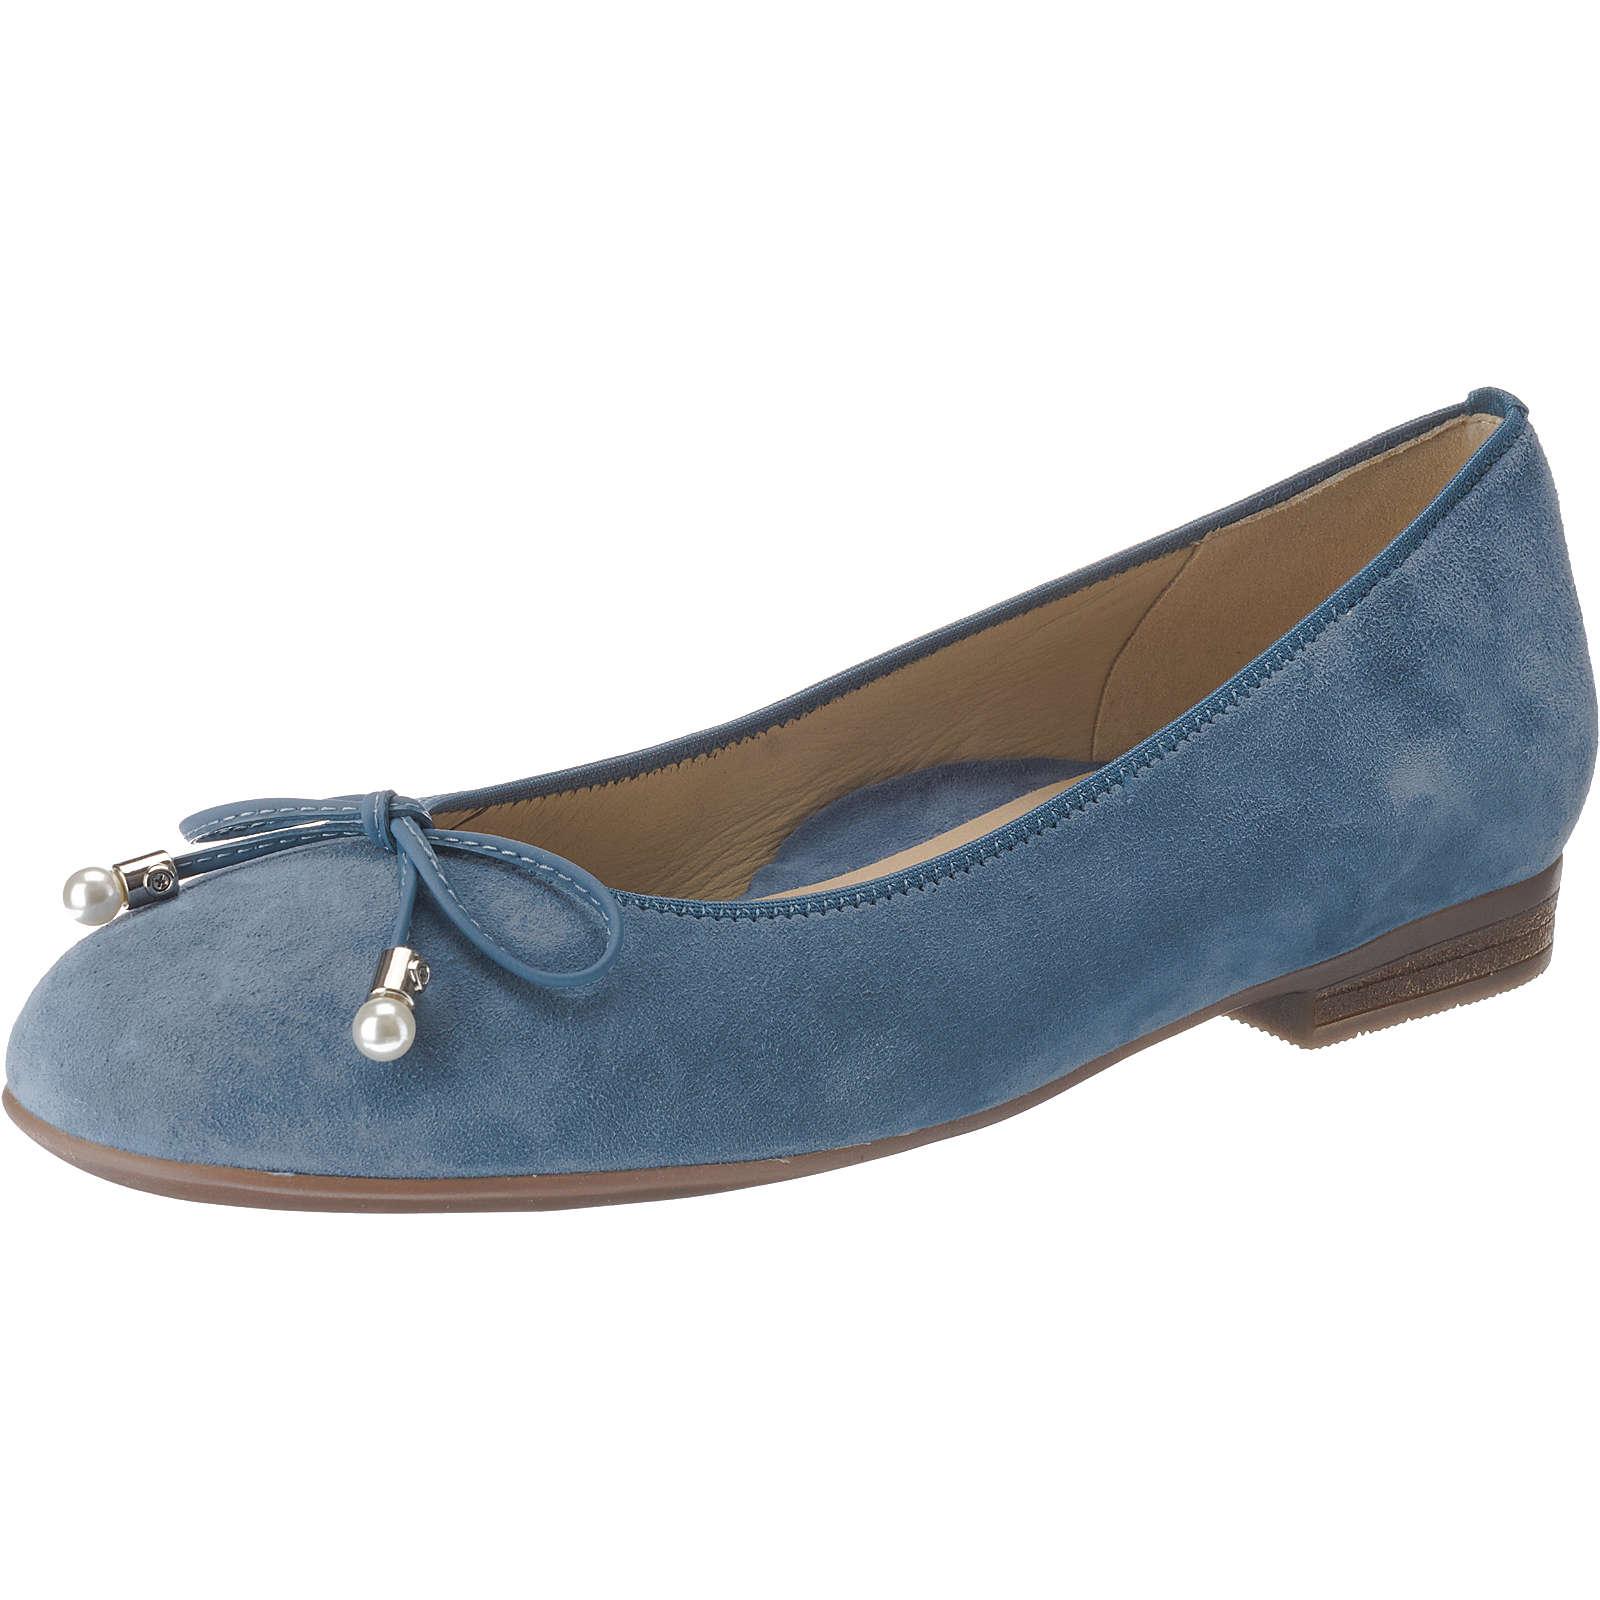 ara SARDINIA Klassische Ballerinas hellblau Damen Gr. 42